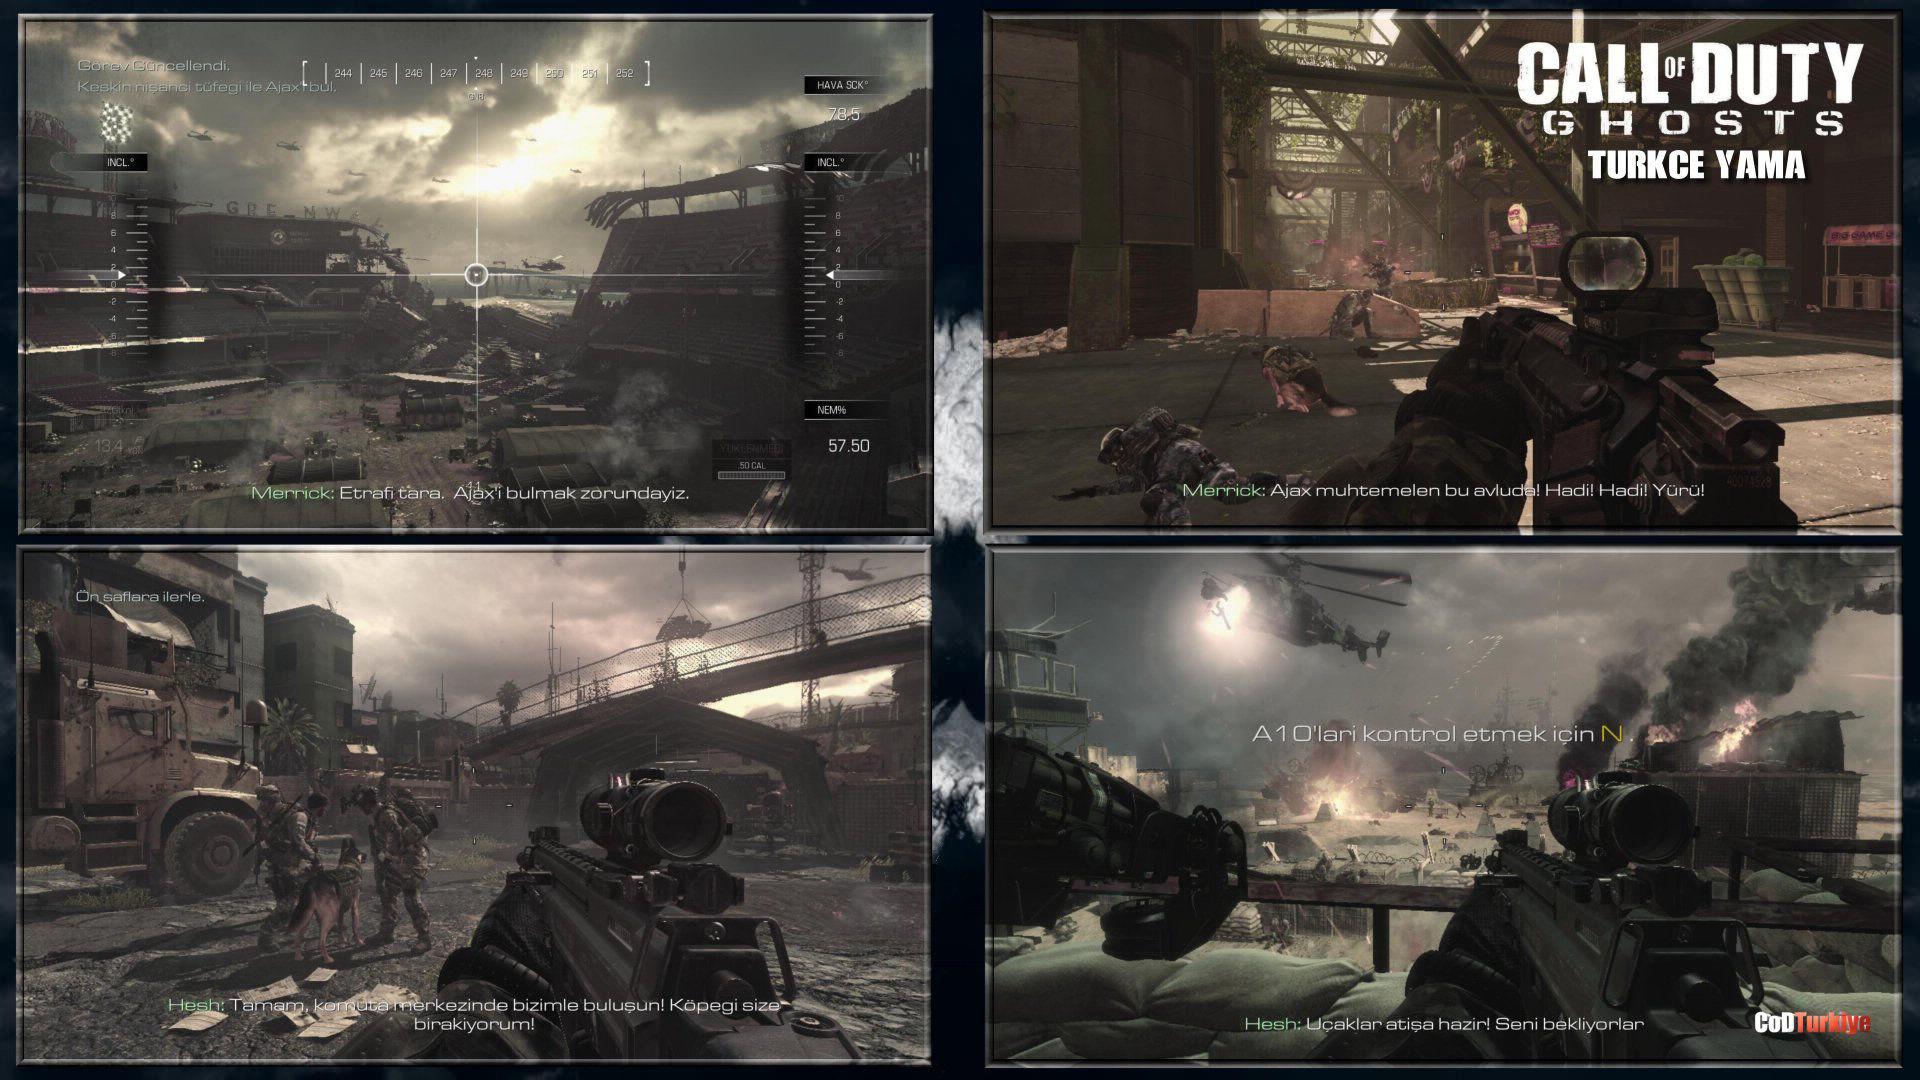 Call of Duty Ghosts Türkçe Yama Gameplay